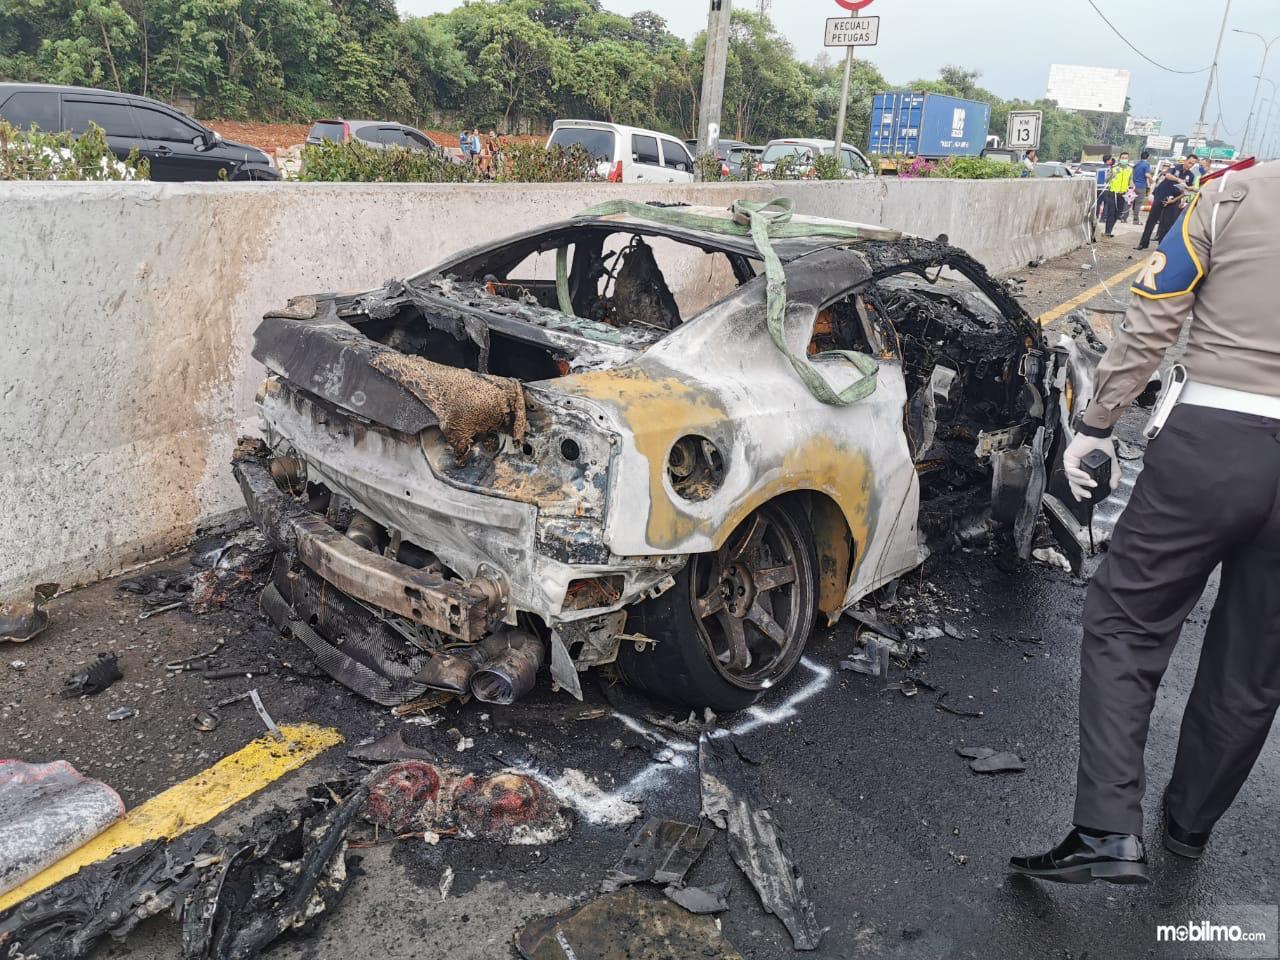 Foto kondisi NIssan GT-R milik Wakil Jaksa Agung RI, Arminsyah yang terbakar habis